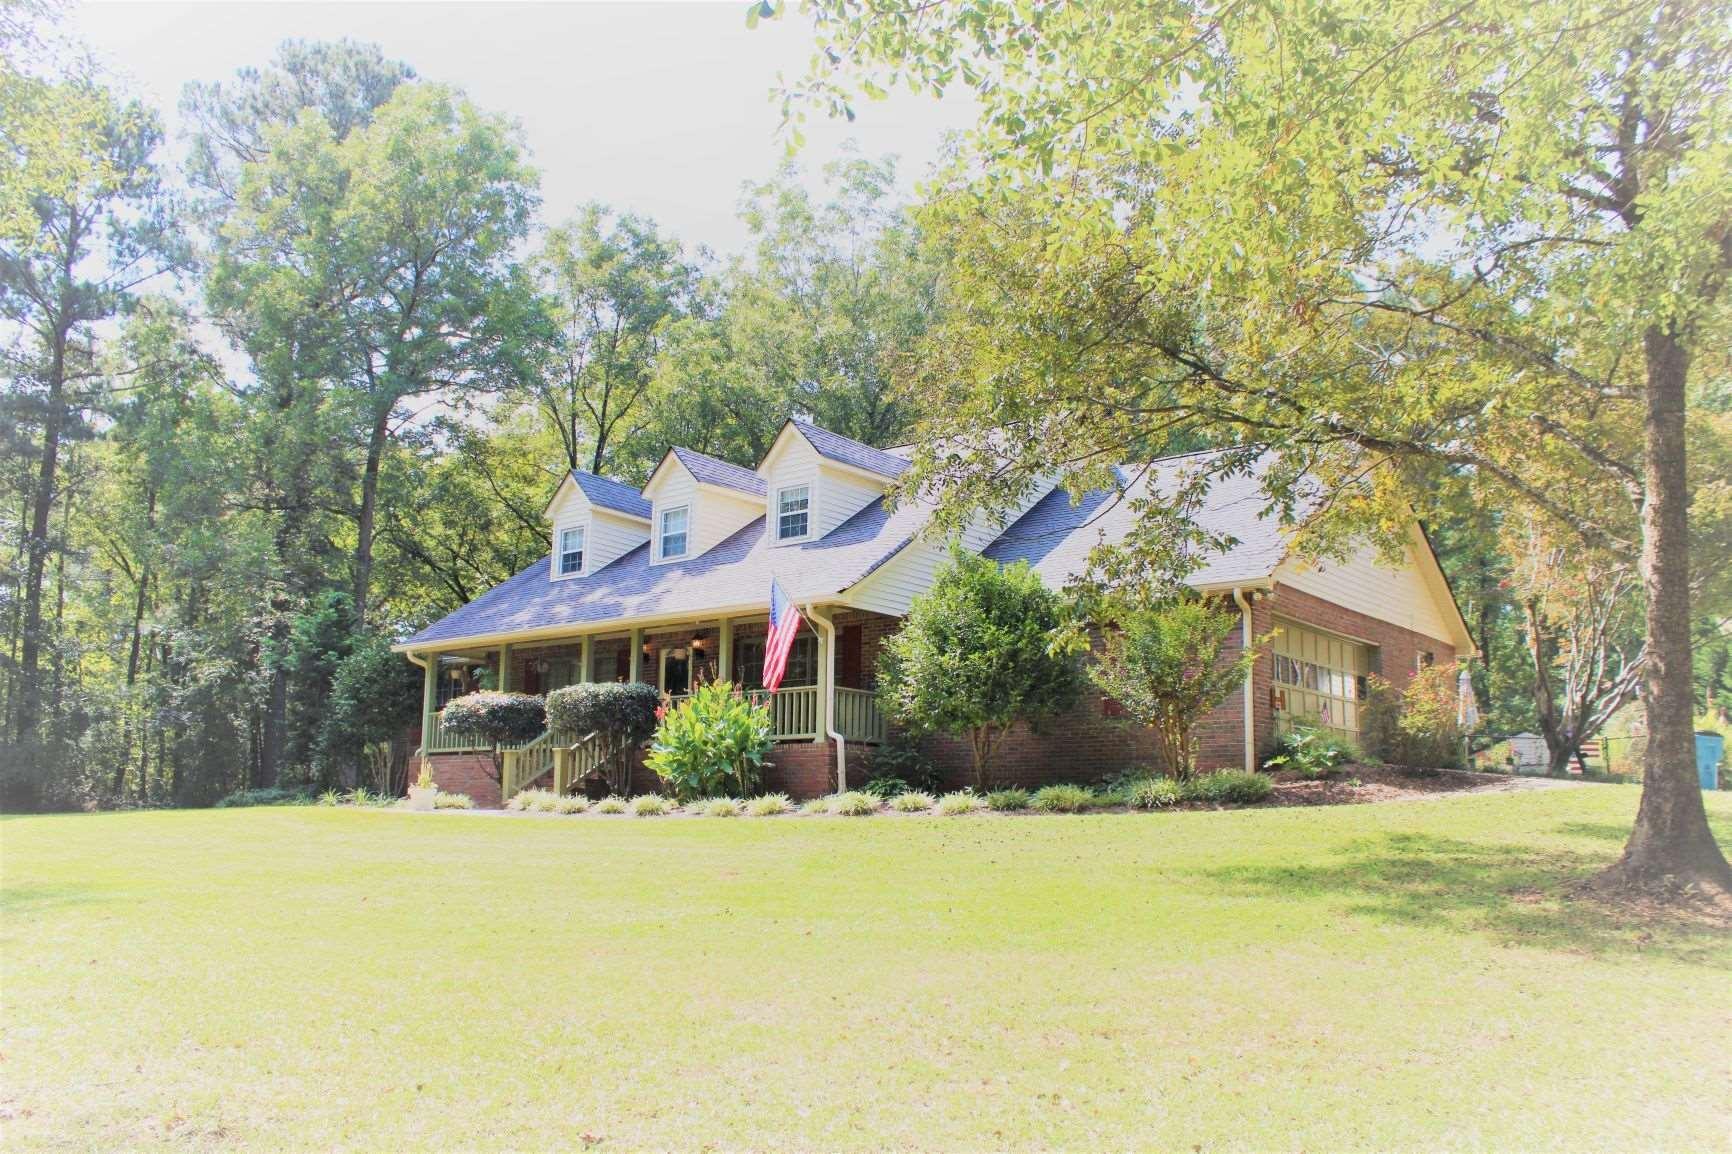 535 Countryside Dr, McDonough, GA 30252 - MLS#: 8869263